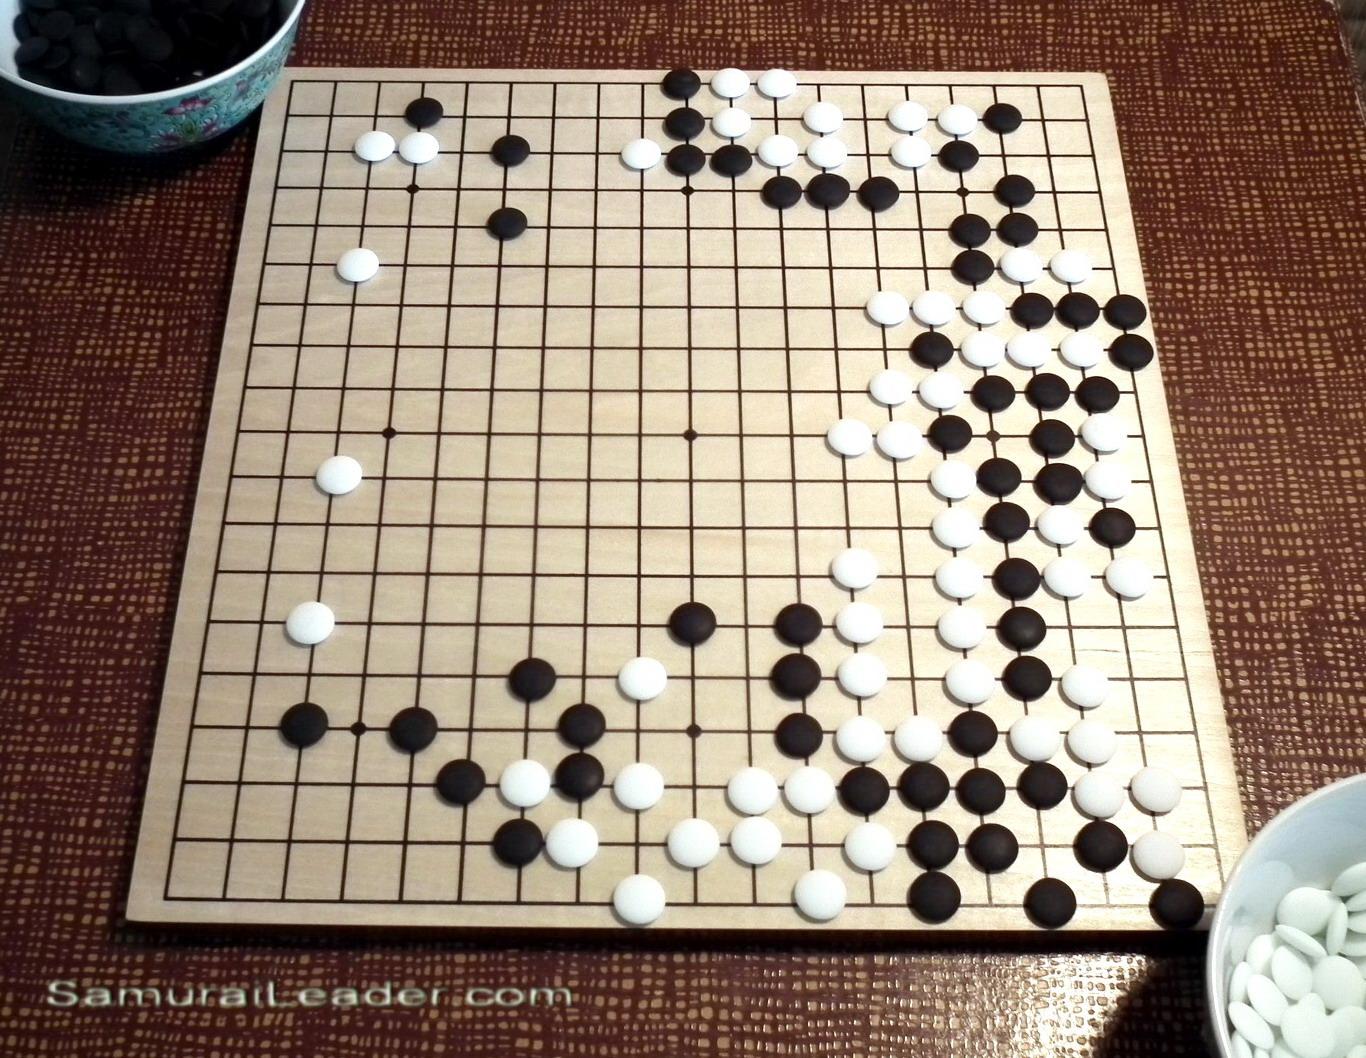 Go Weiqi Baduk Diagram Of A Famous Game Played In 1846 Between Shusaku And Gennan Inseki